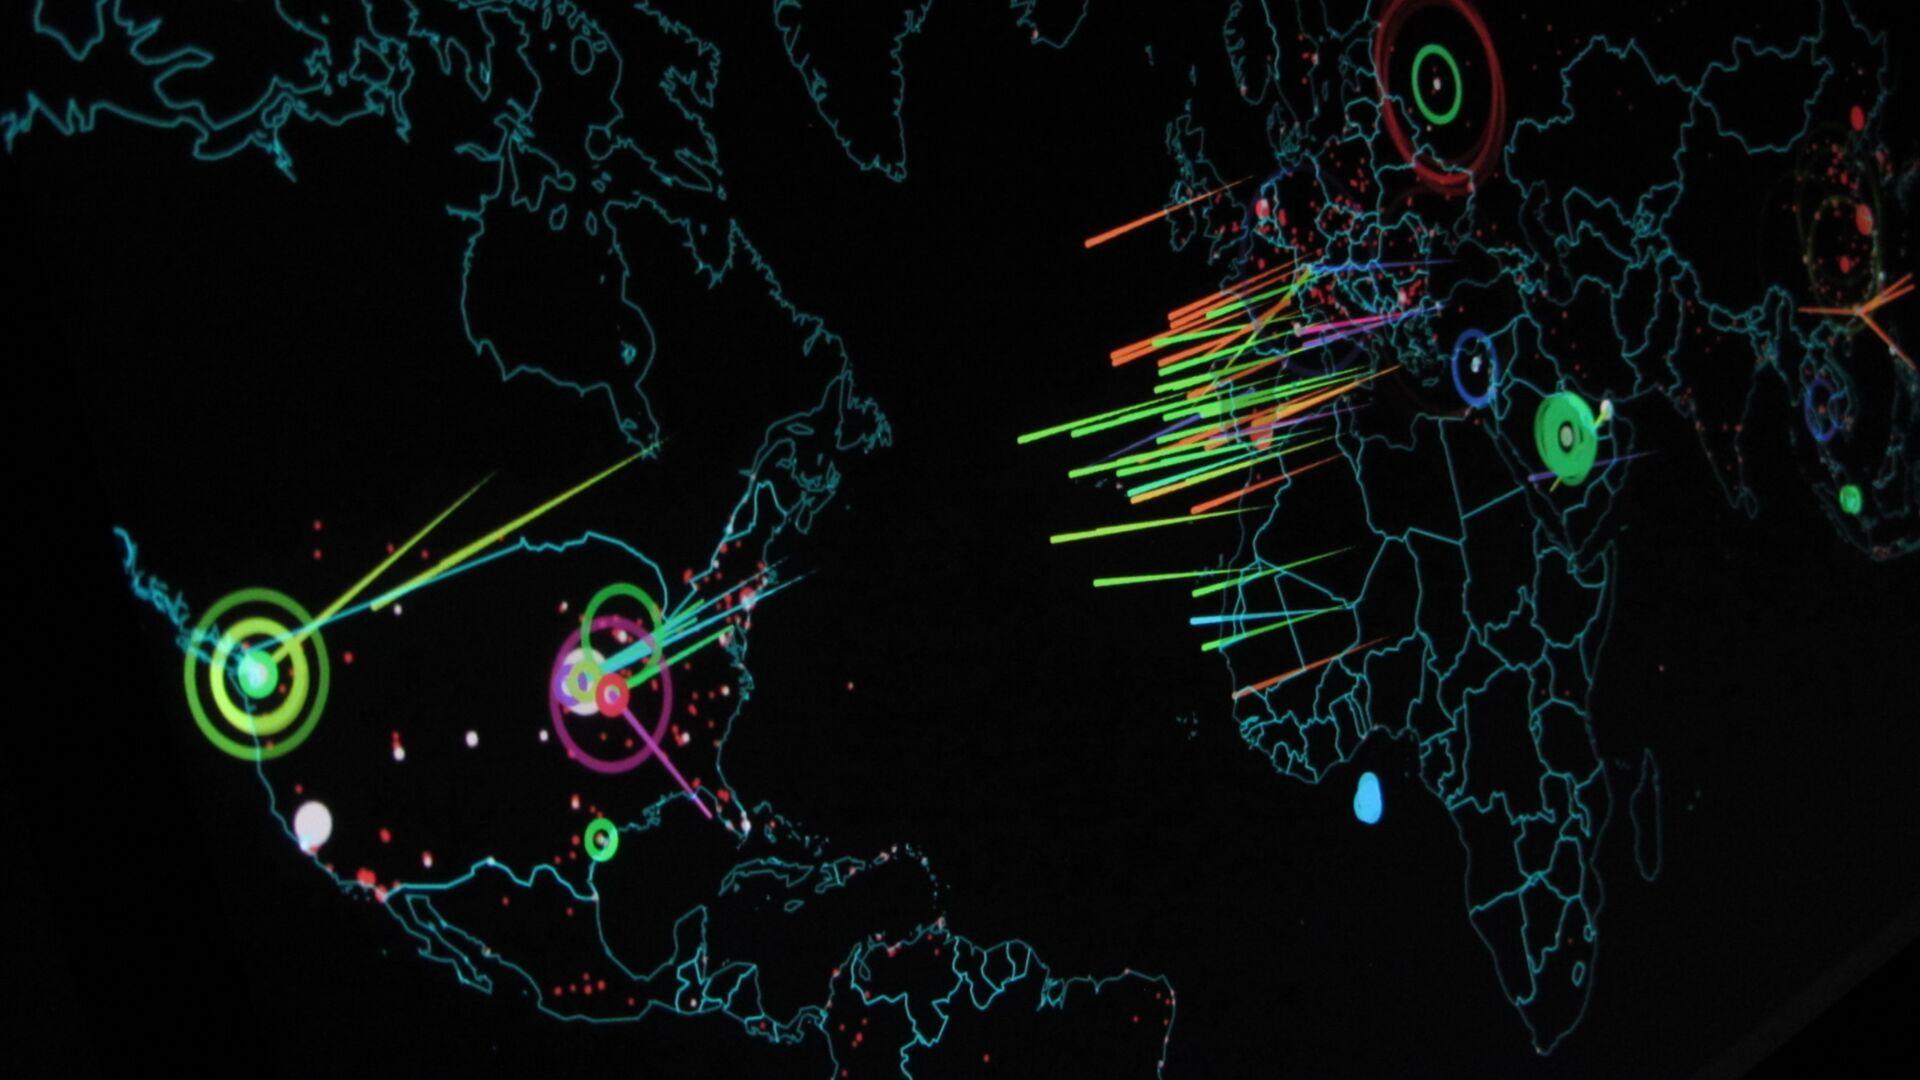 Ciberataques (imagen referencial) - Sputnik Mundo, 1920, 18.05.2021